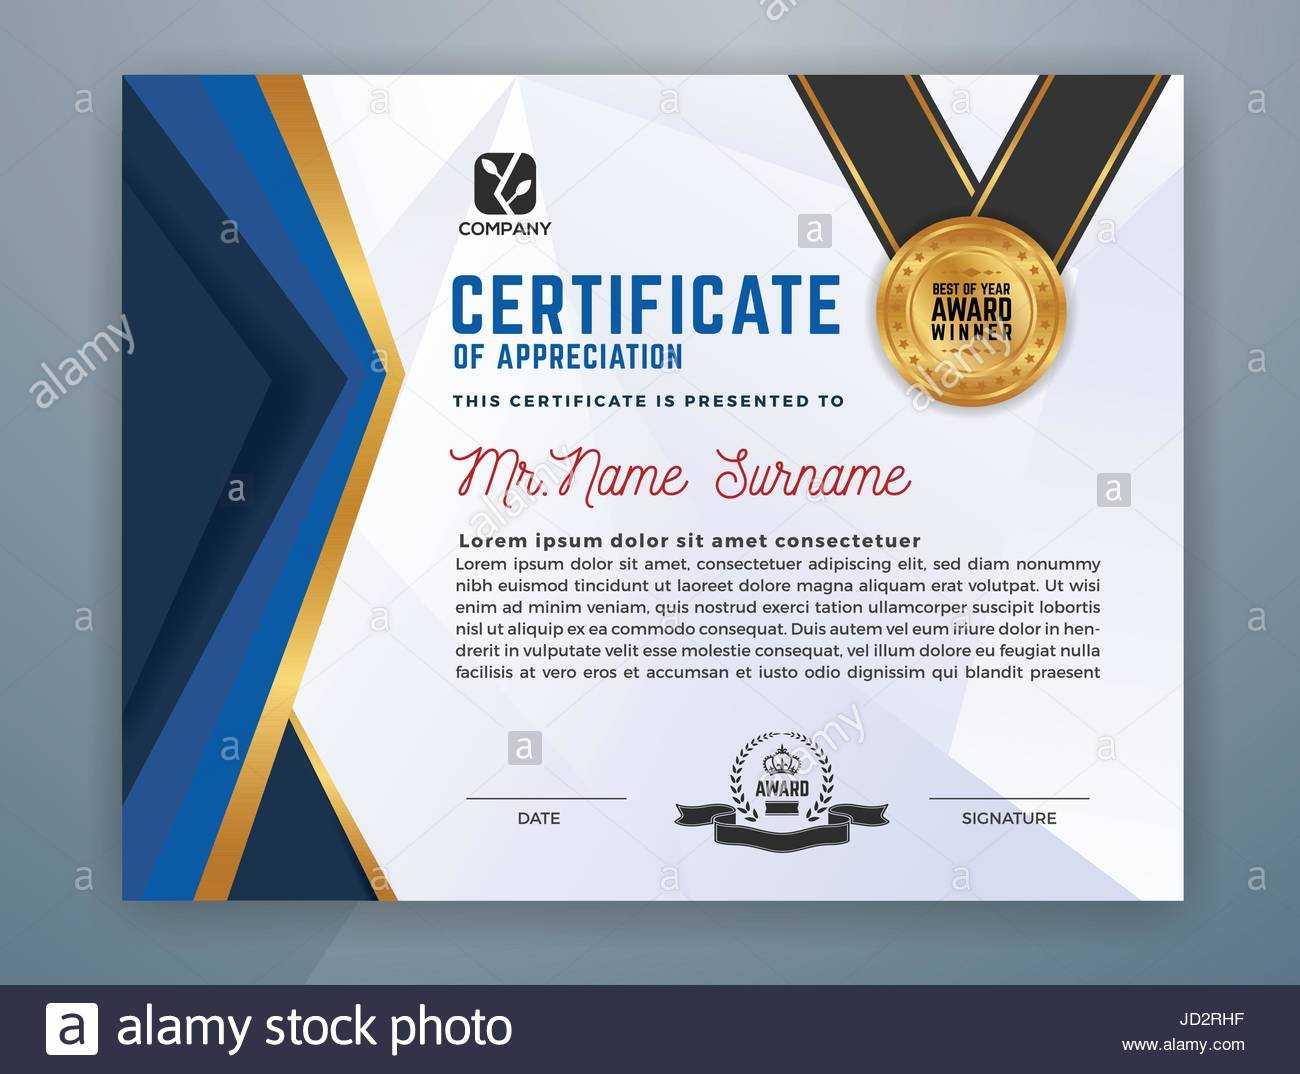 Multipurpose Modern Professional Certificate Template Design Regarding Design A Certificate Template